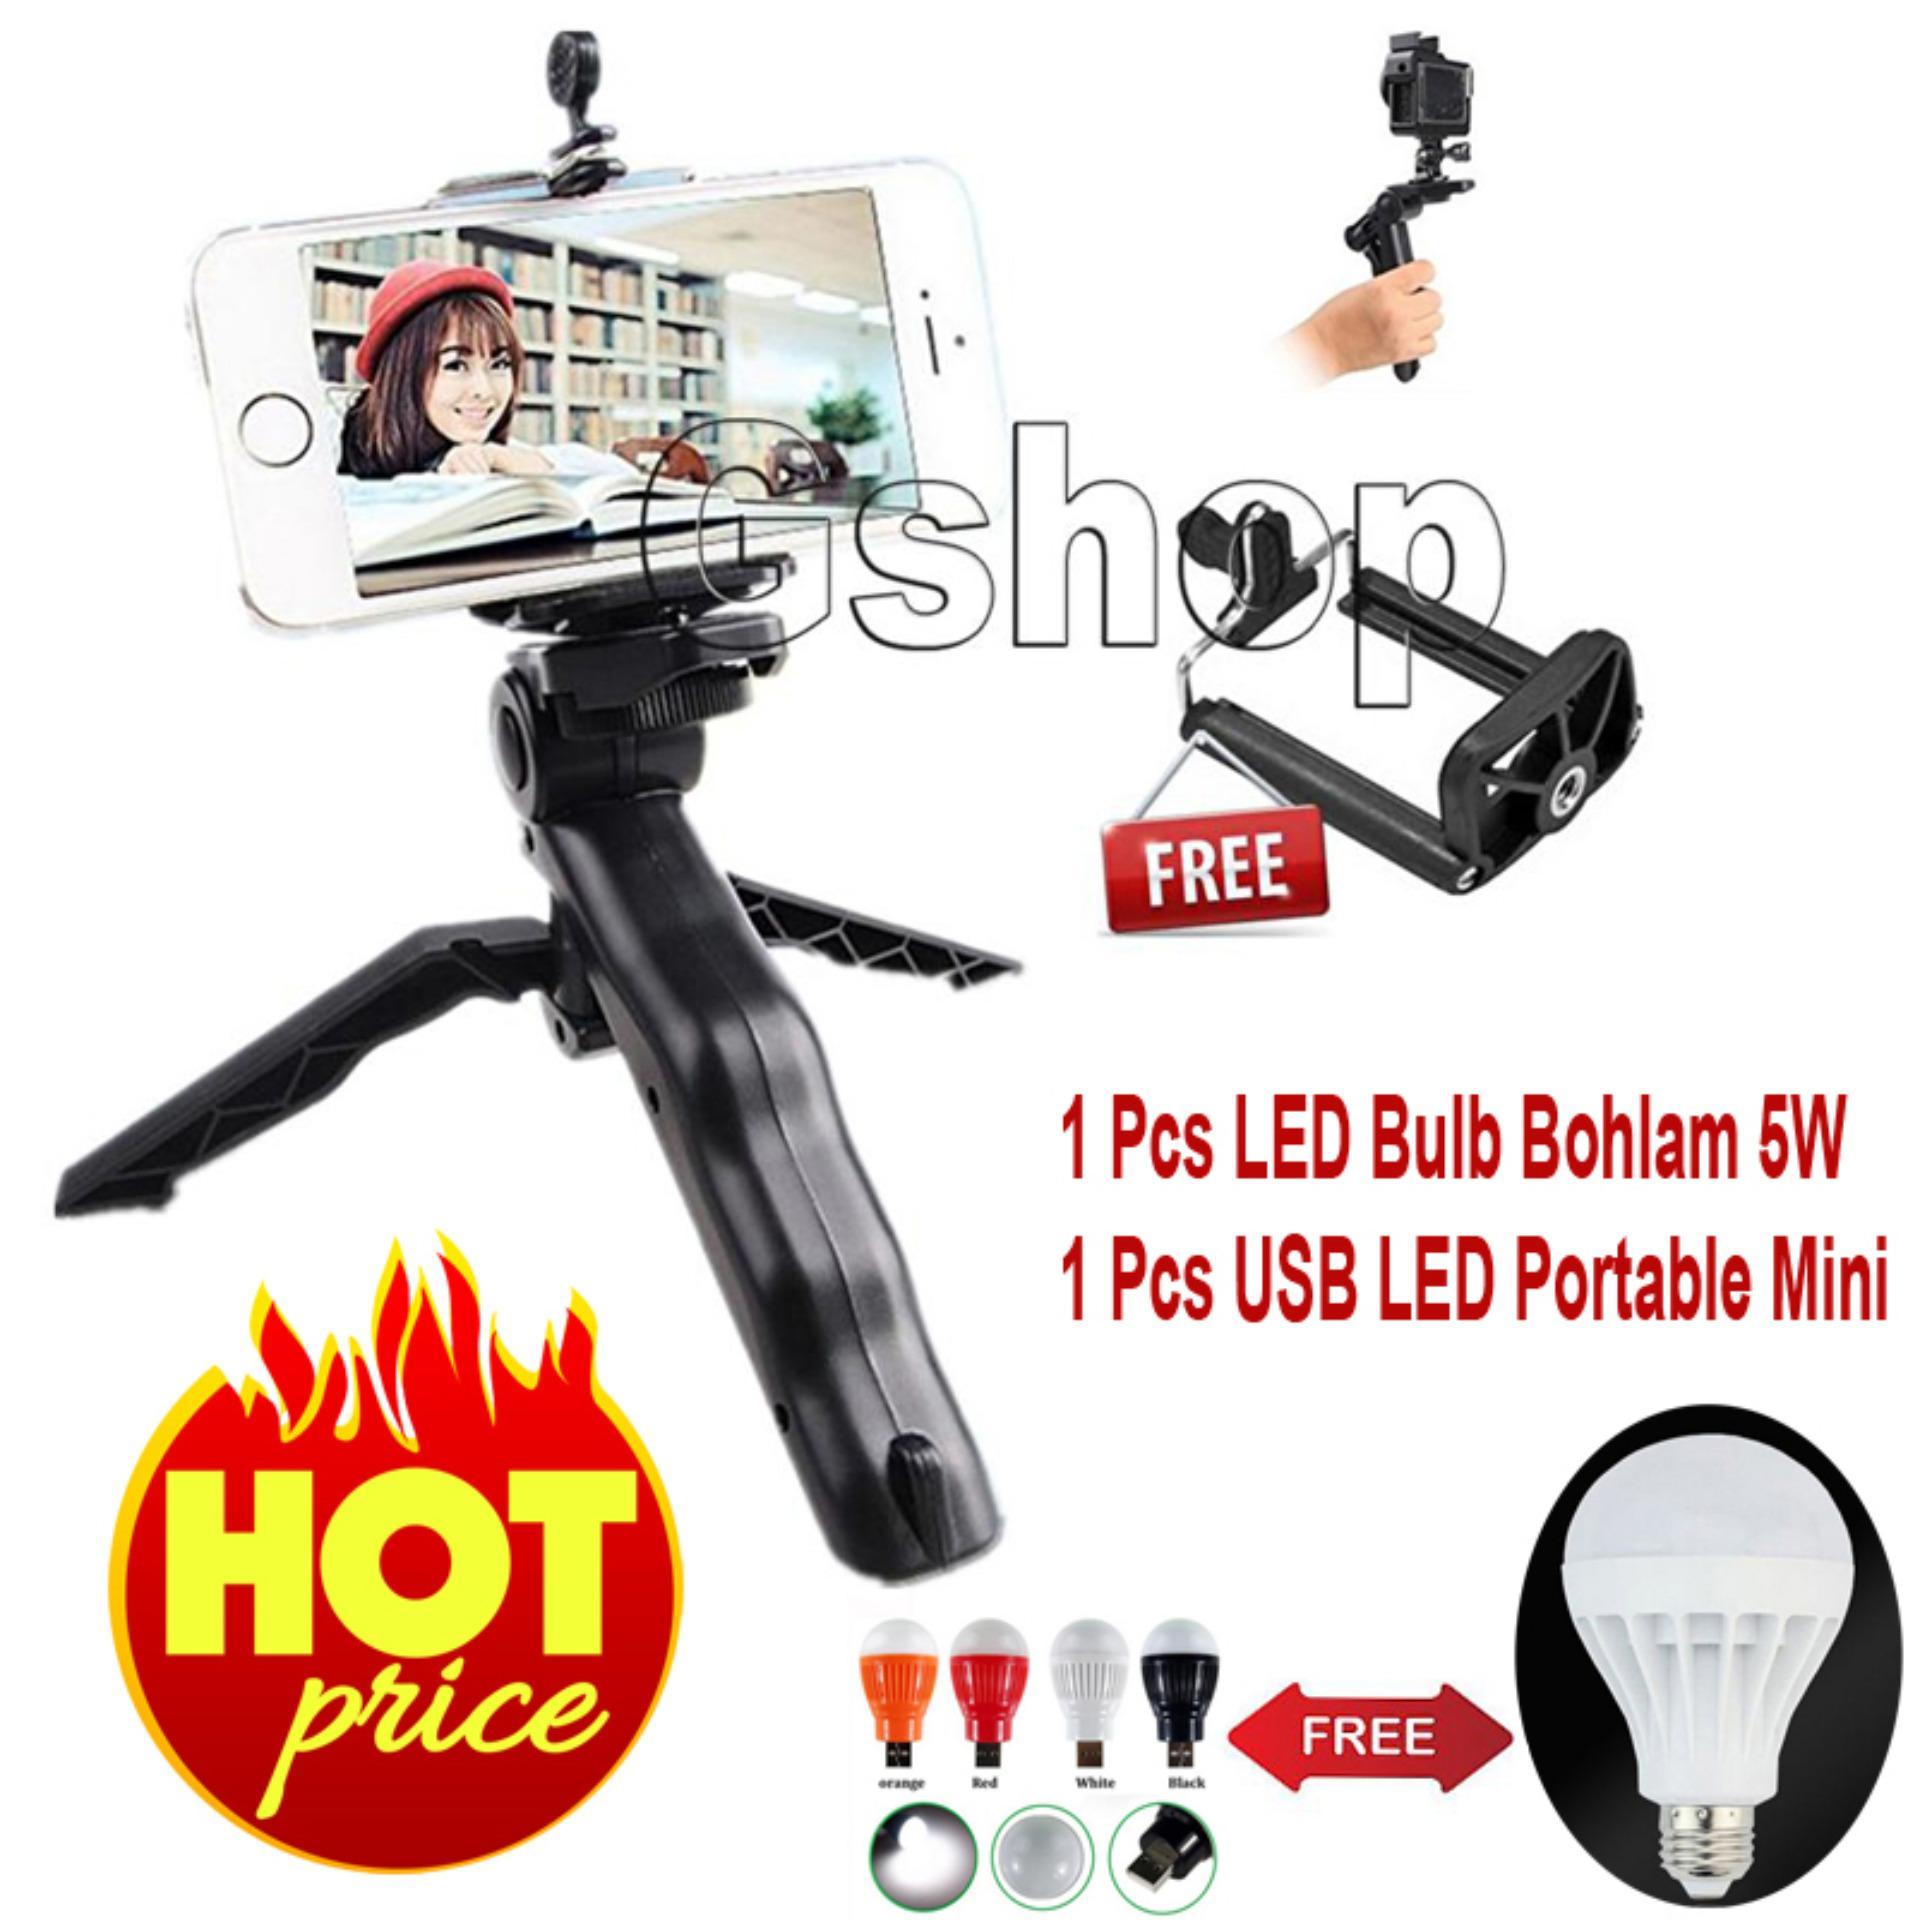 Flash Sale Gshop Mini Tripod Multi Fungsi For Smartphone & GoPro +U Holder+ LED Bulb 5W + USB LED Portable